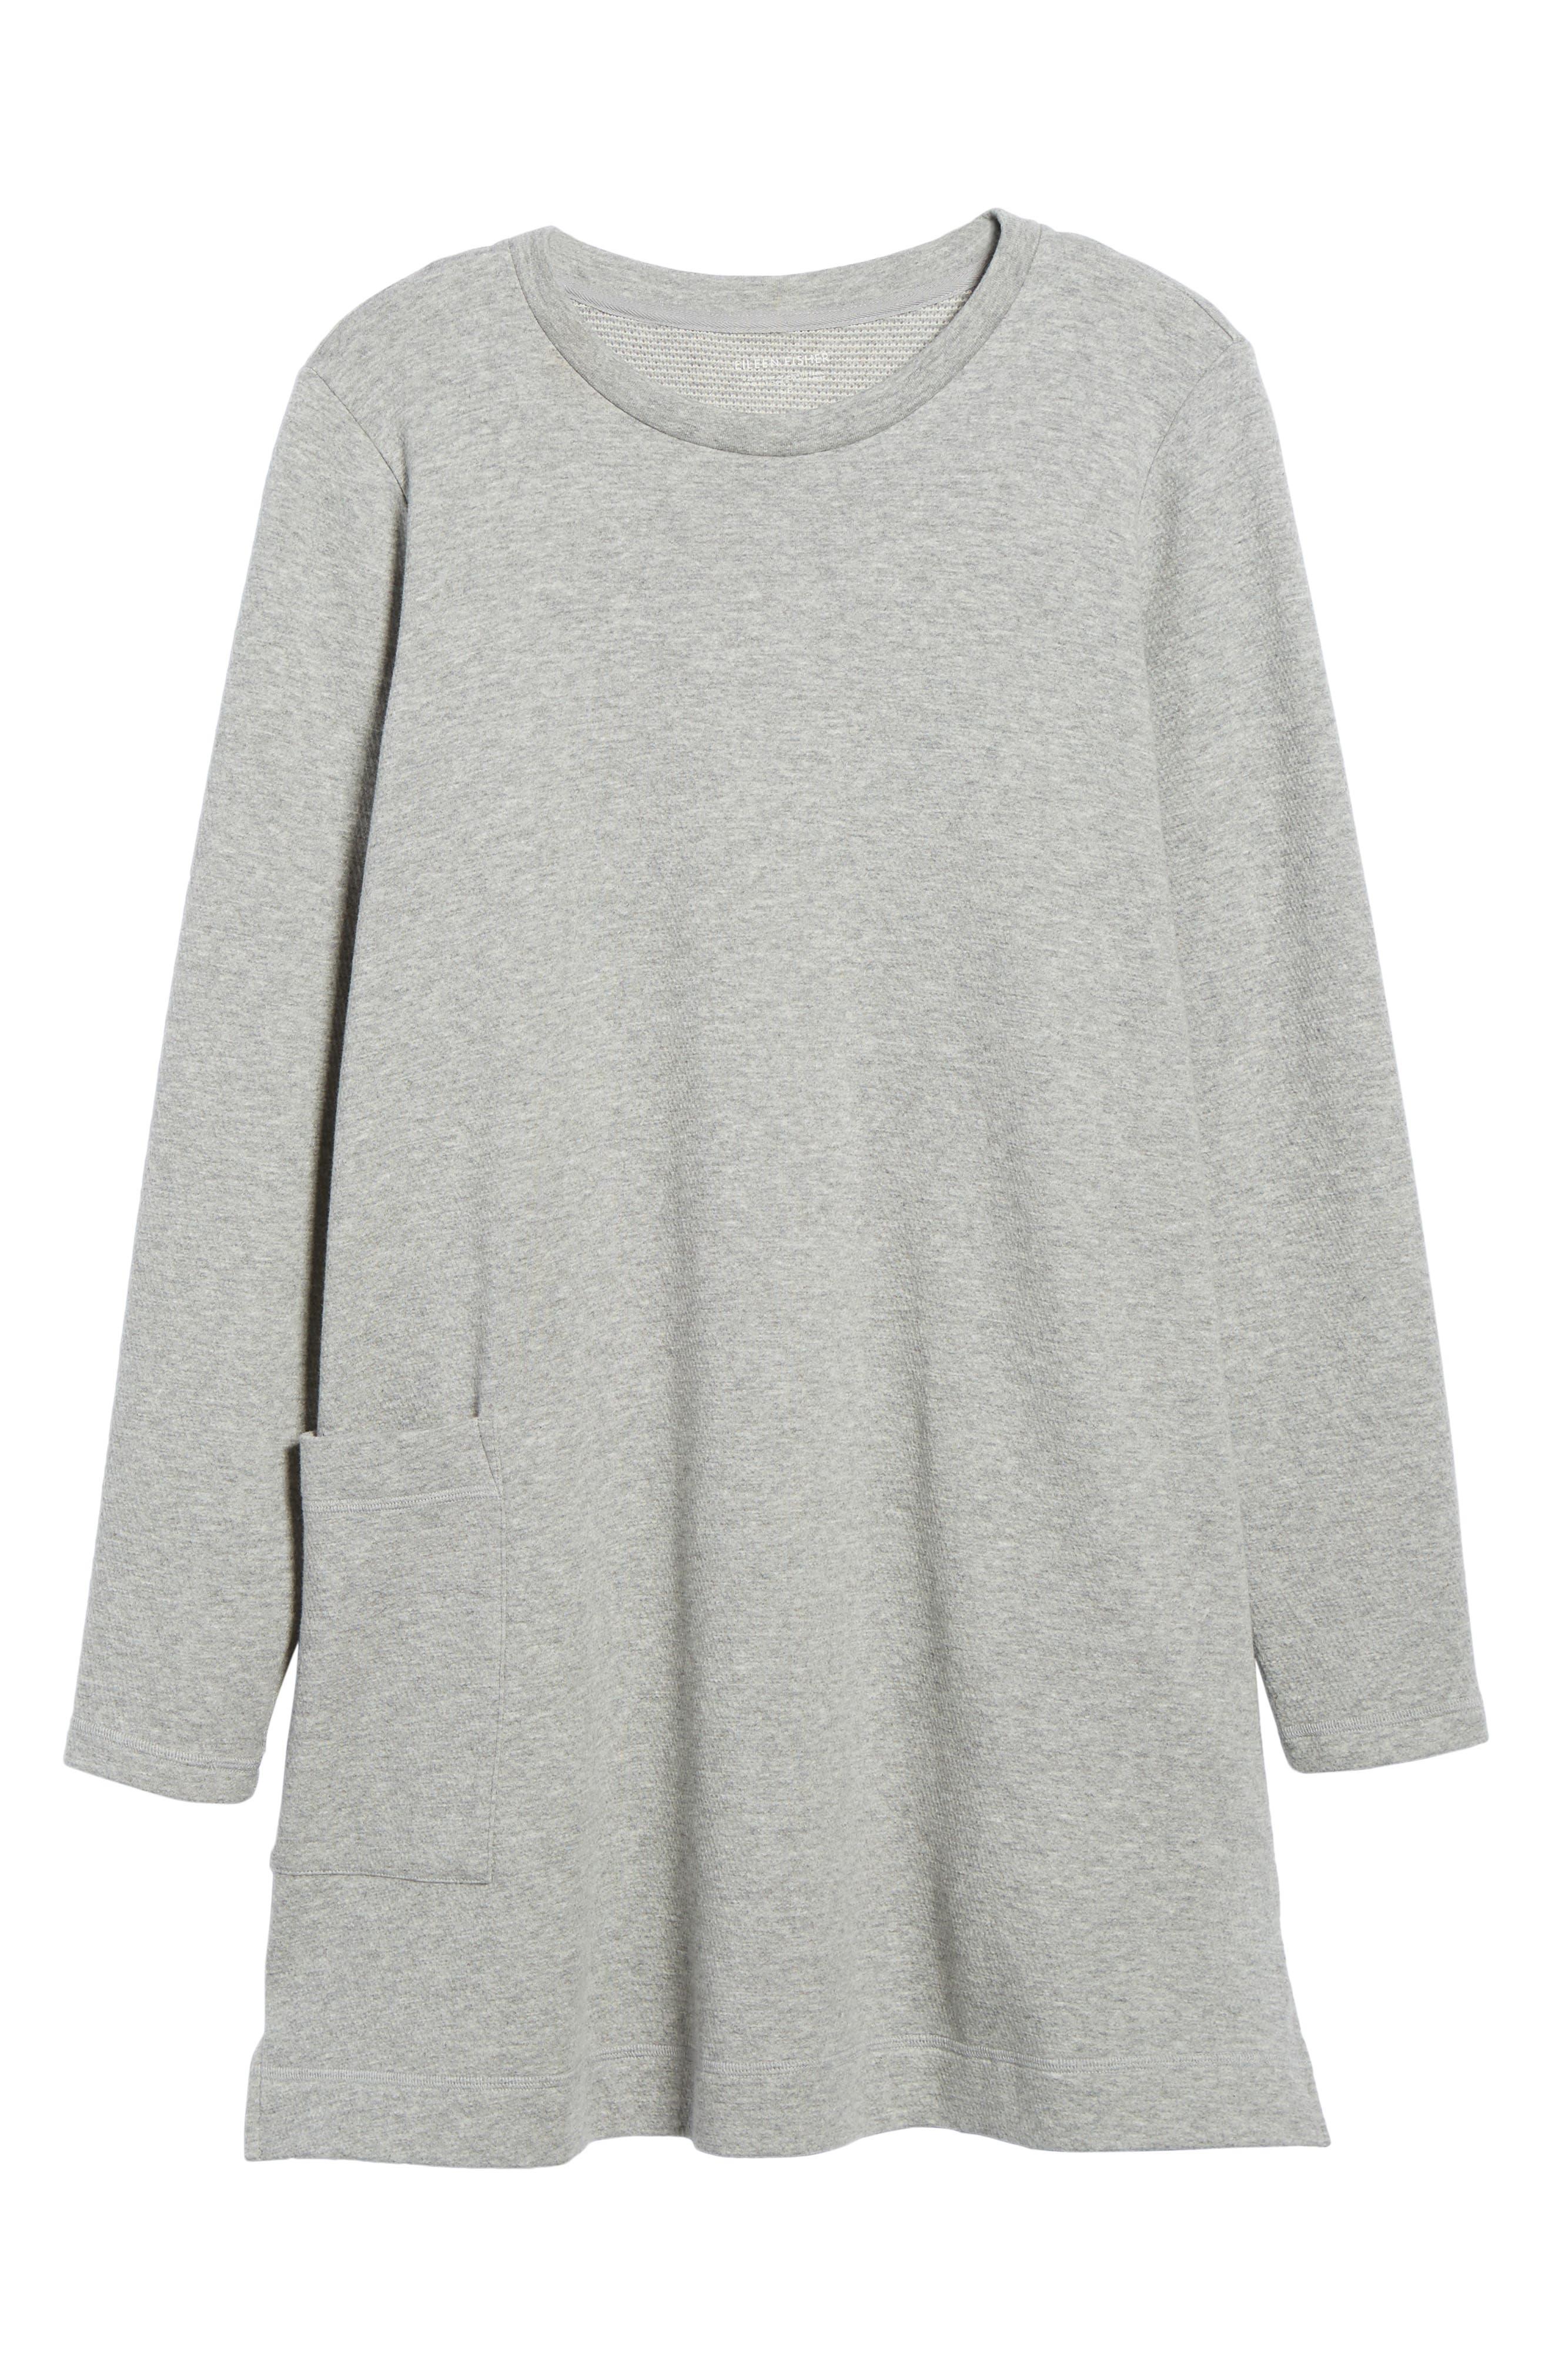 Double Knit Organic Cotton Tunic,                             Alternate thumbnail 6, color,                             022